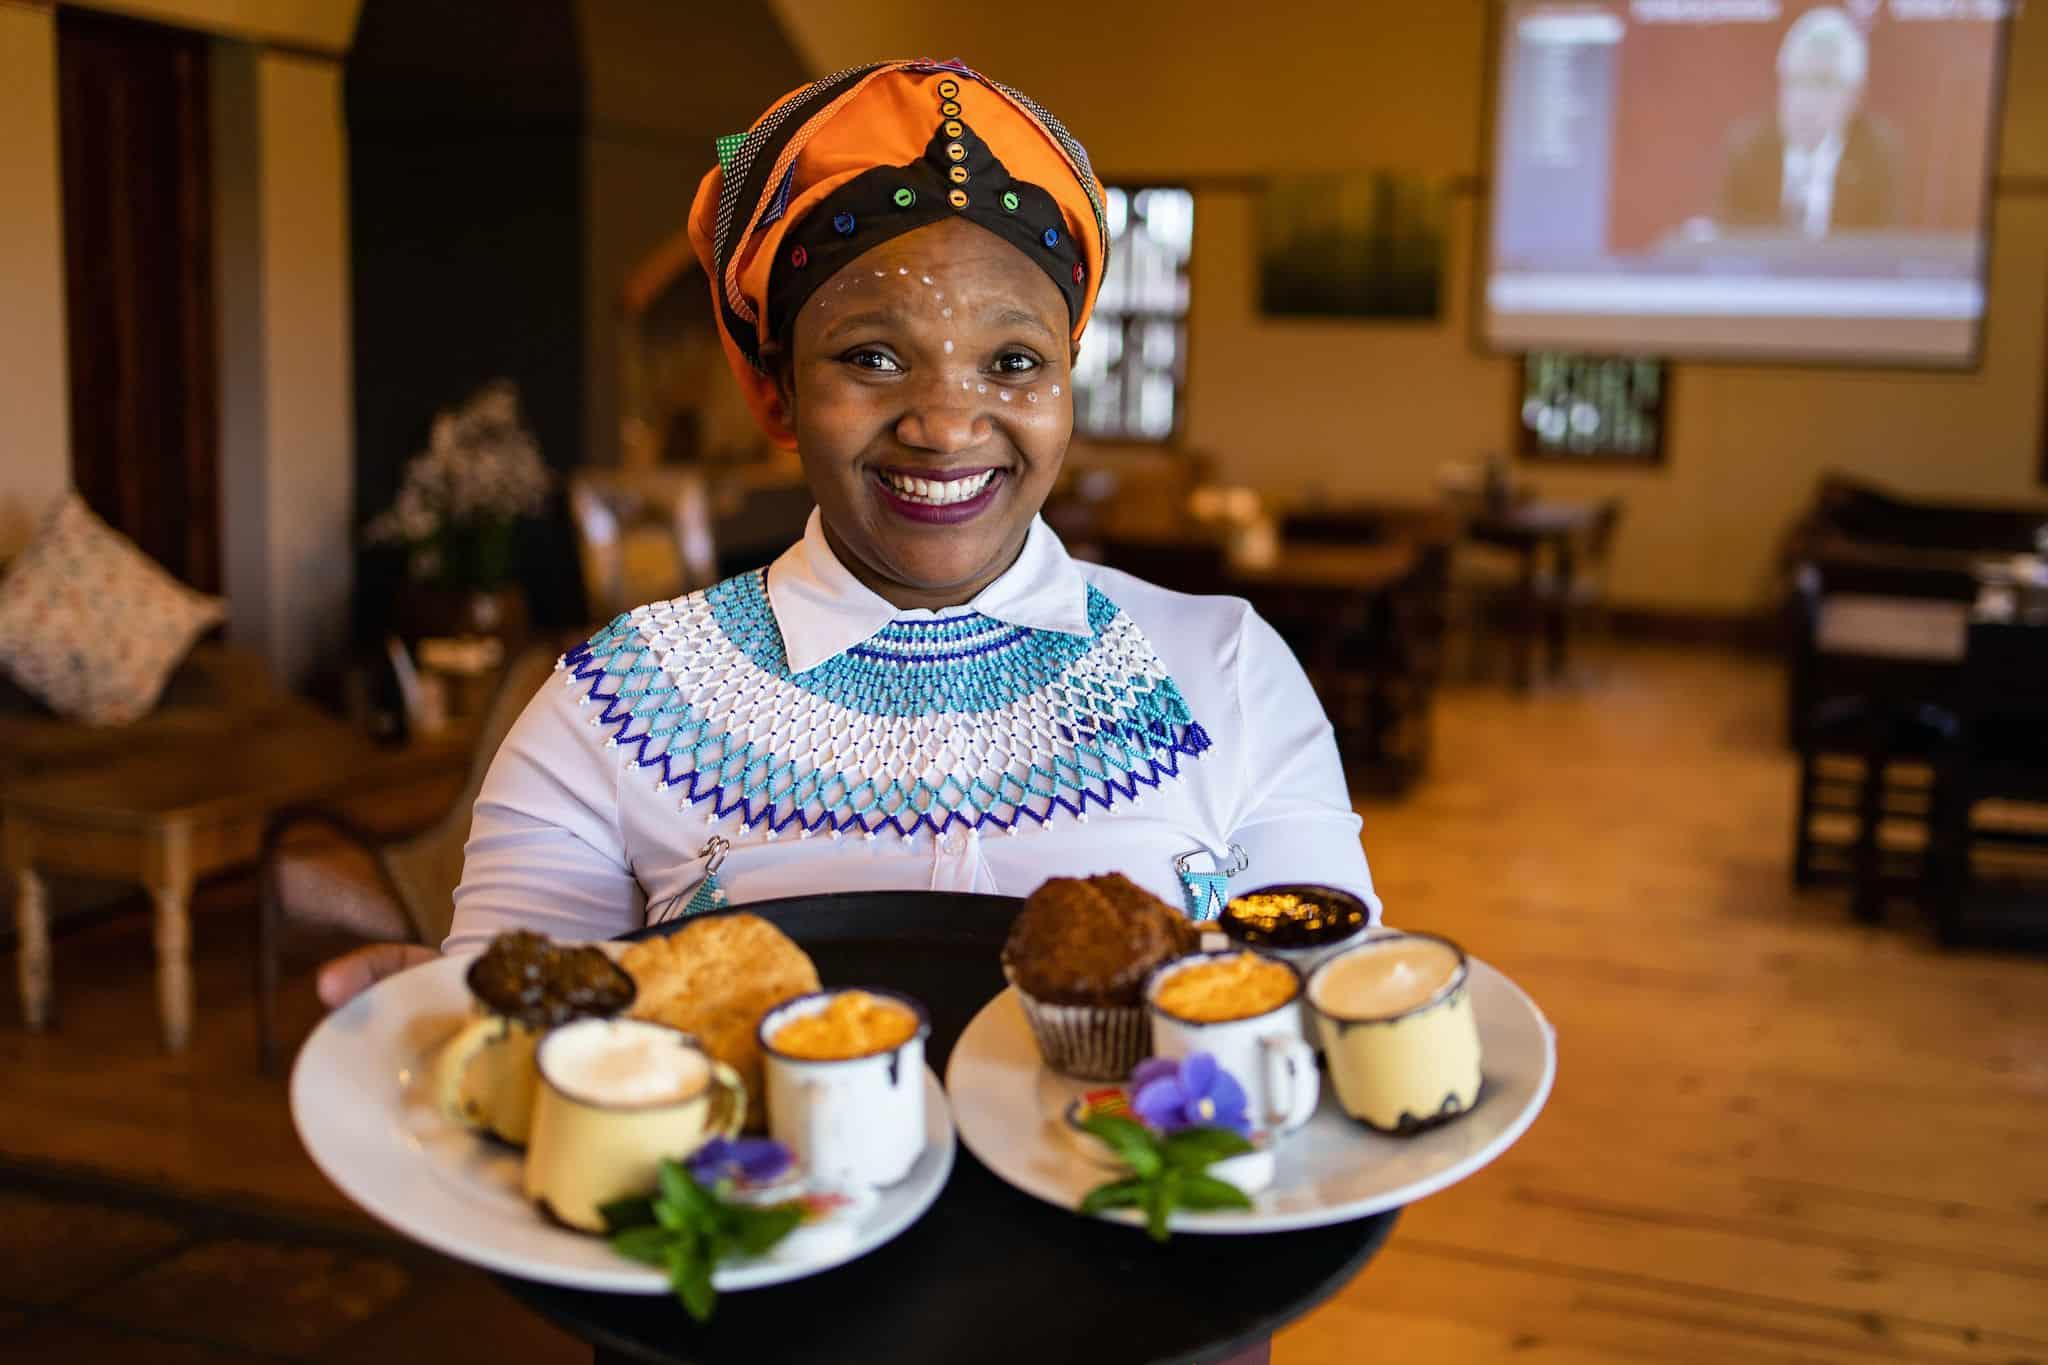 Nanaga muffins and scones